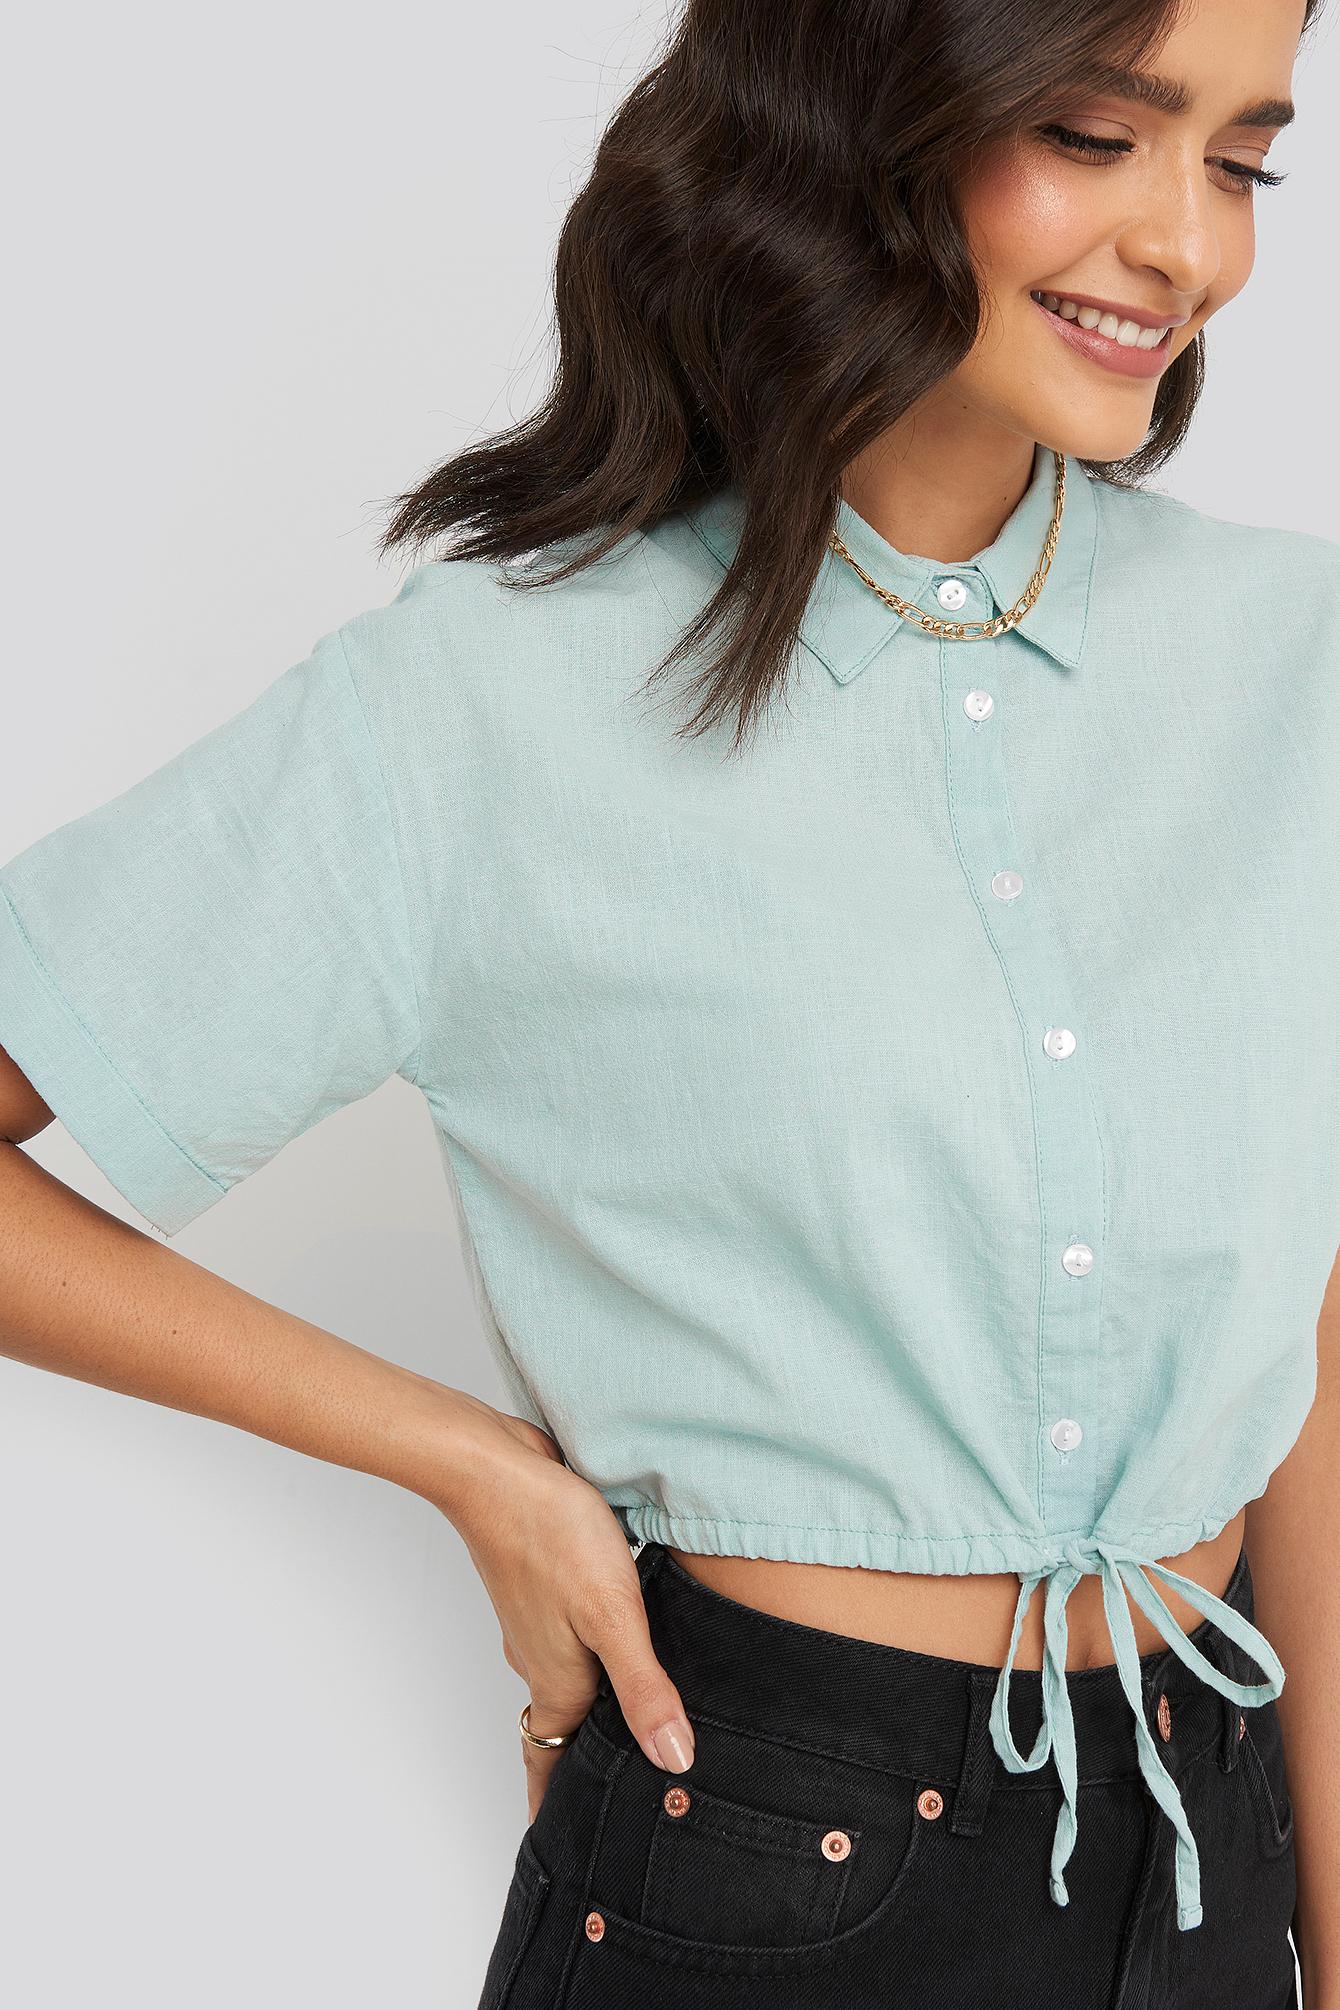 Trendyol Mint Crop Shirt - Turquoise | Bekleidung > Shirts > Sonstige Shirts | Trendyol